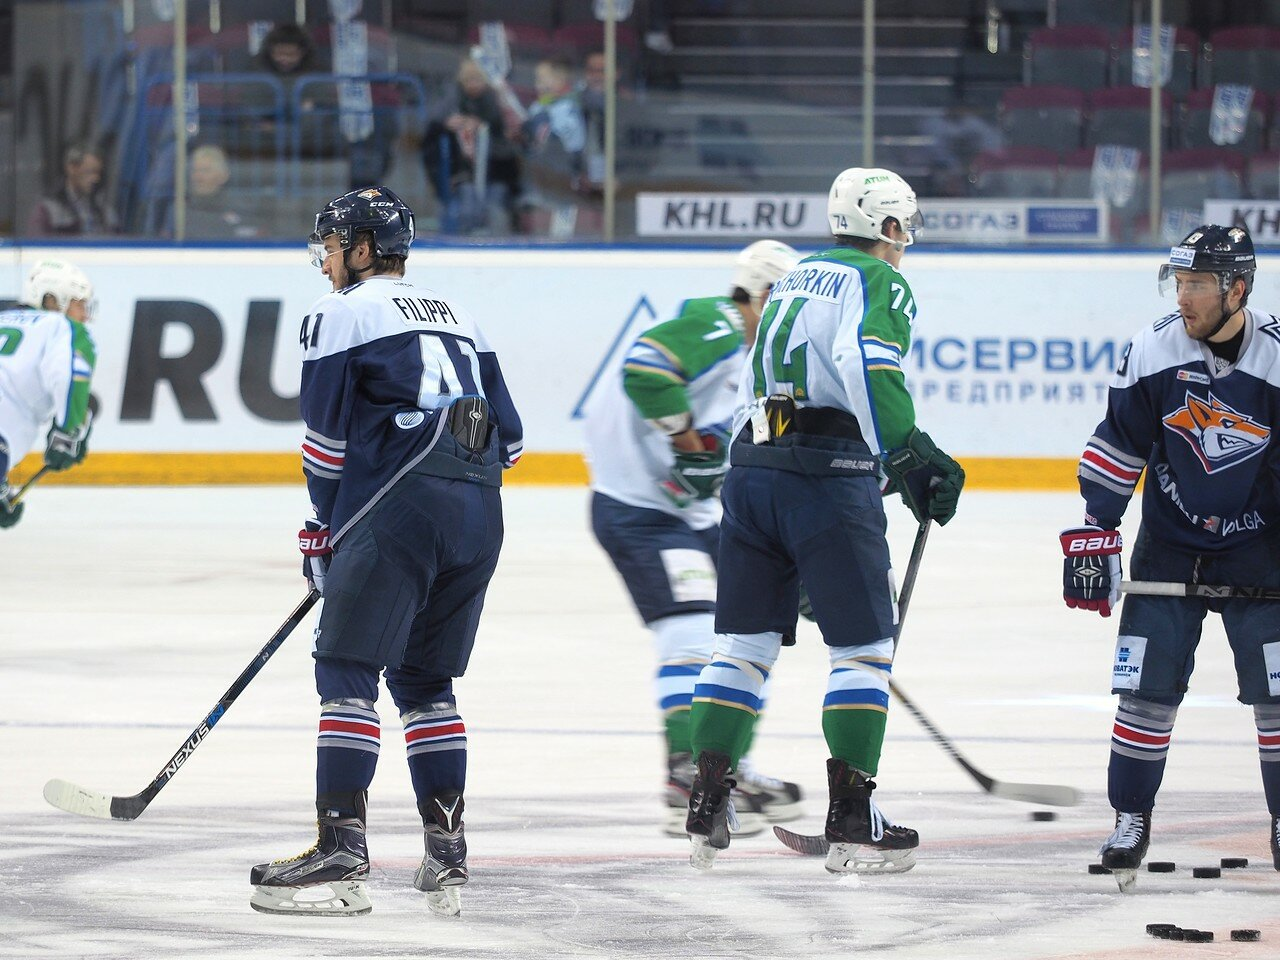 31Плей-офф 2016 Восток Финал Металлург - Салават Юлаев 23.03.2016